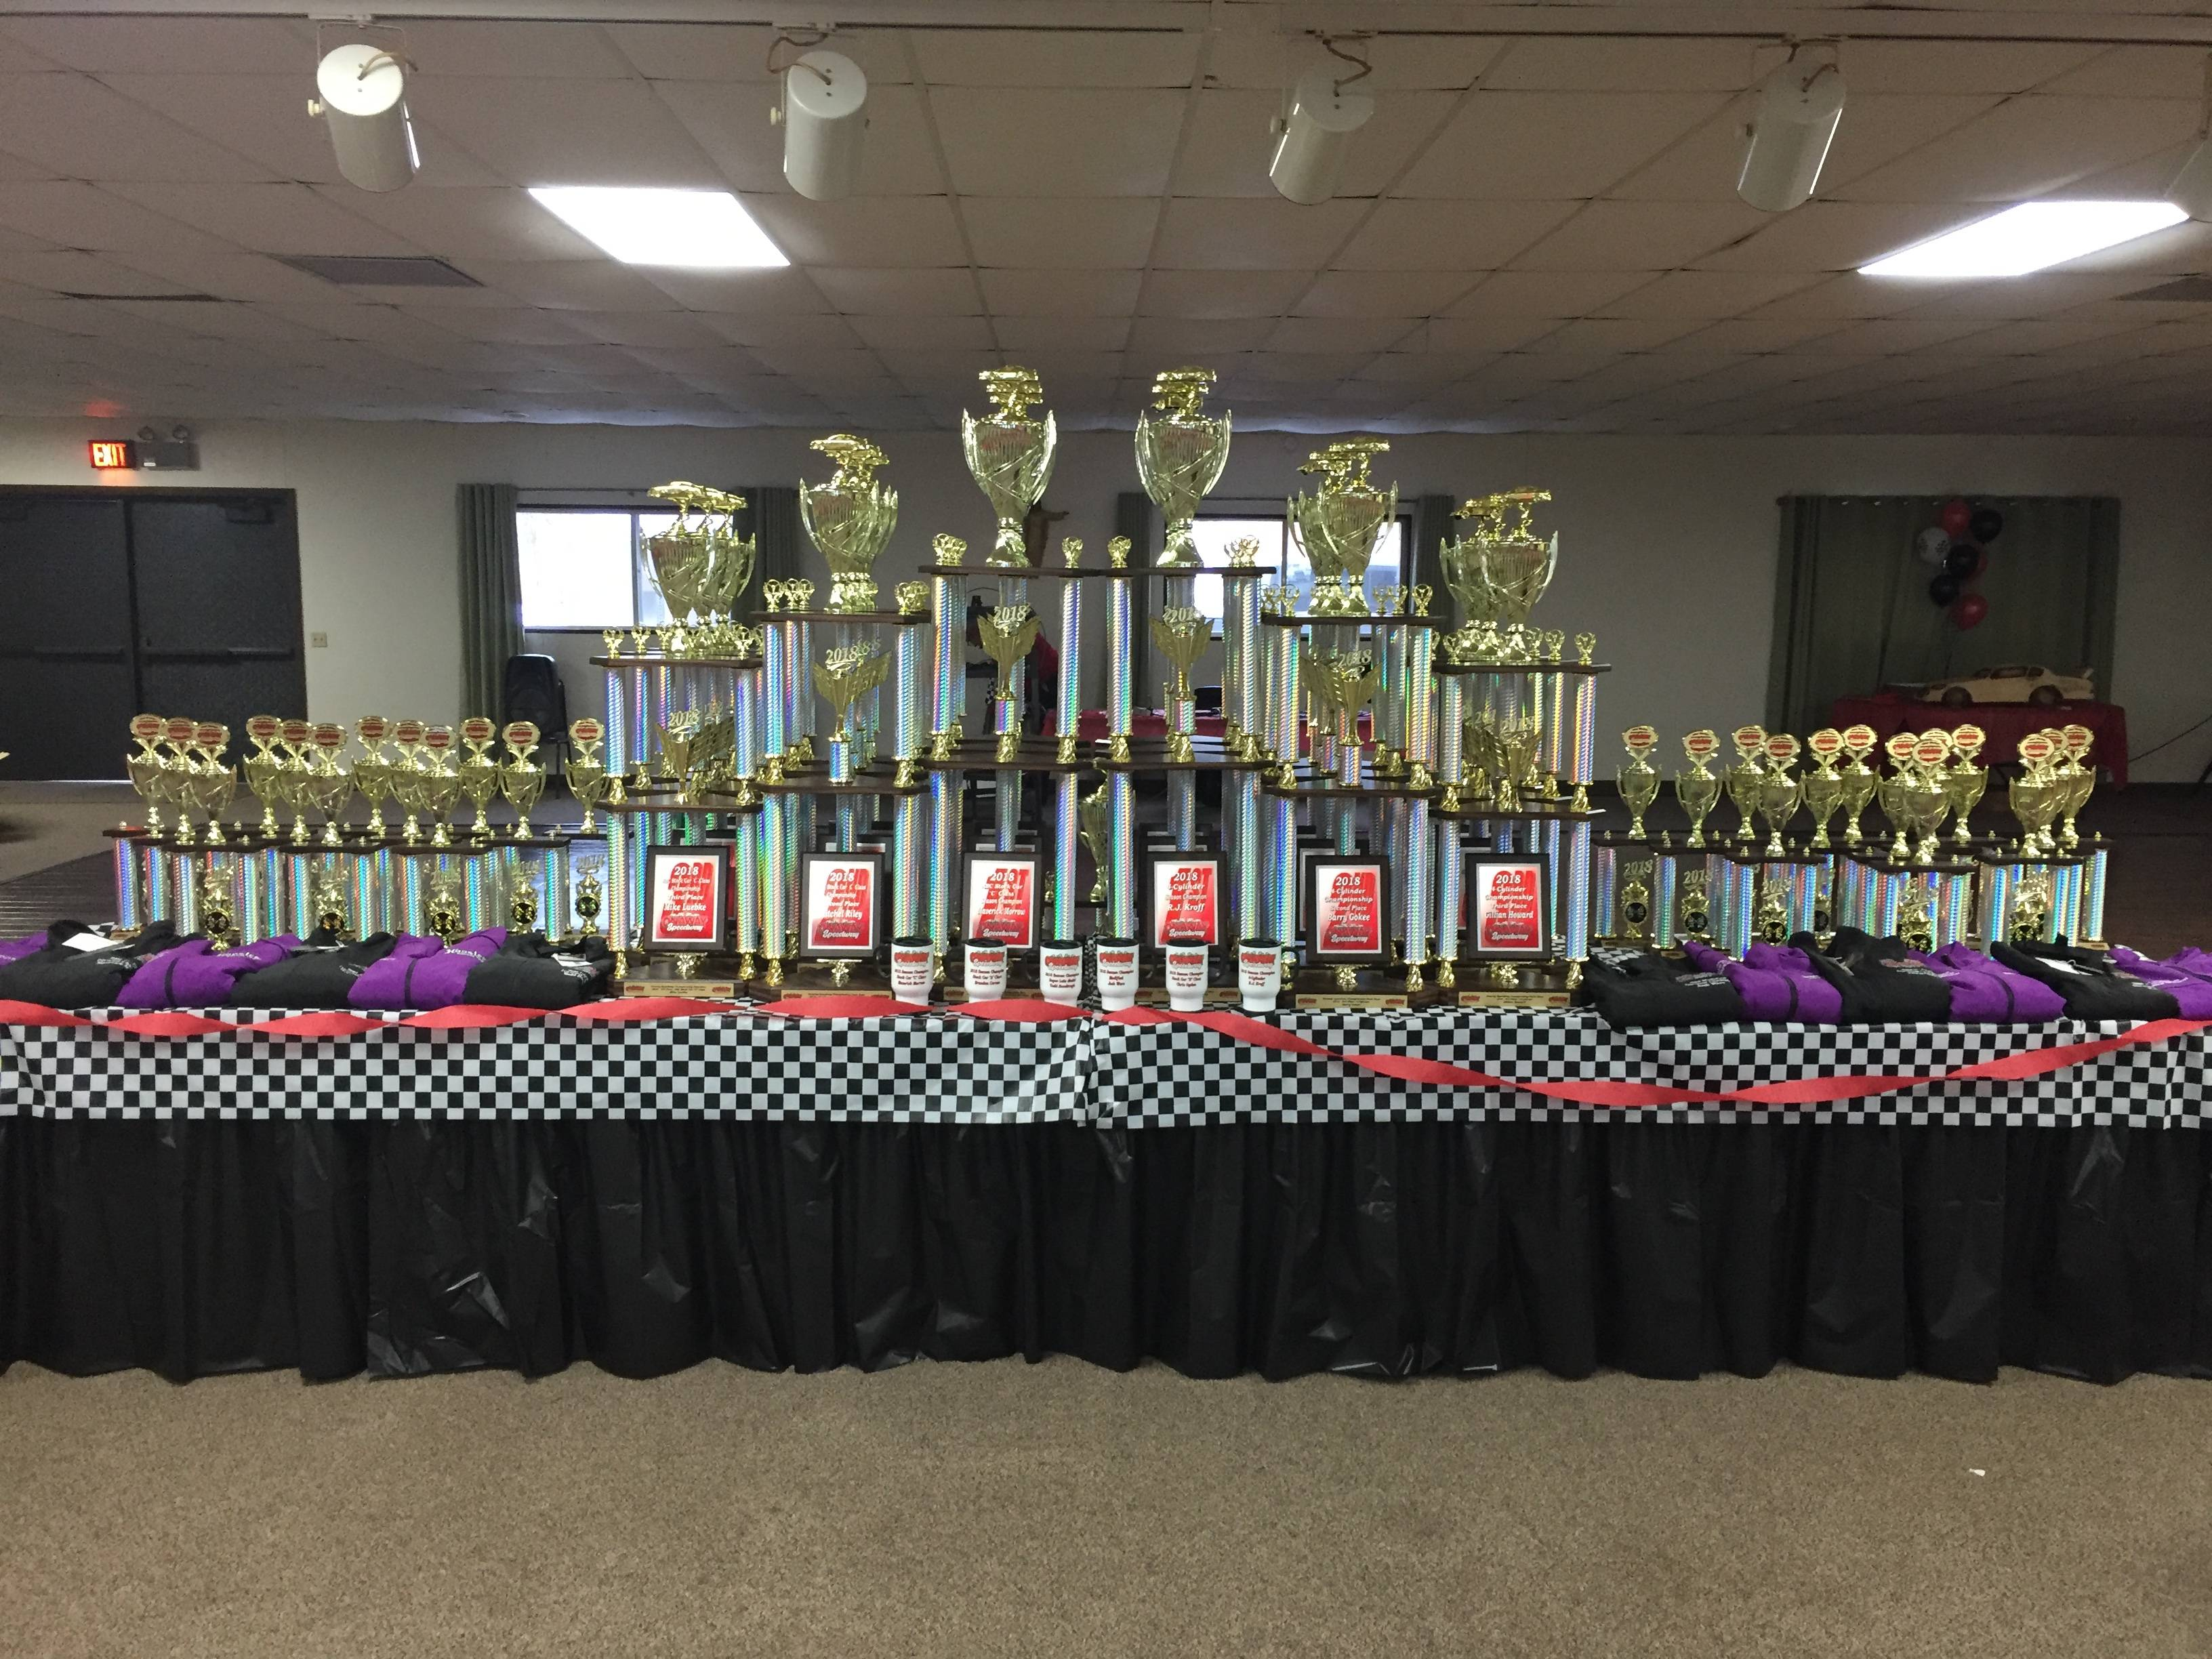 Goin' Green Trophies & Awards, 891 US 31 South, Traverse City, MI, 49685, USA